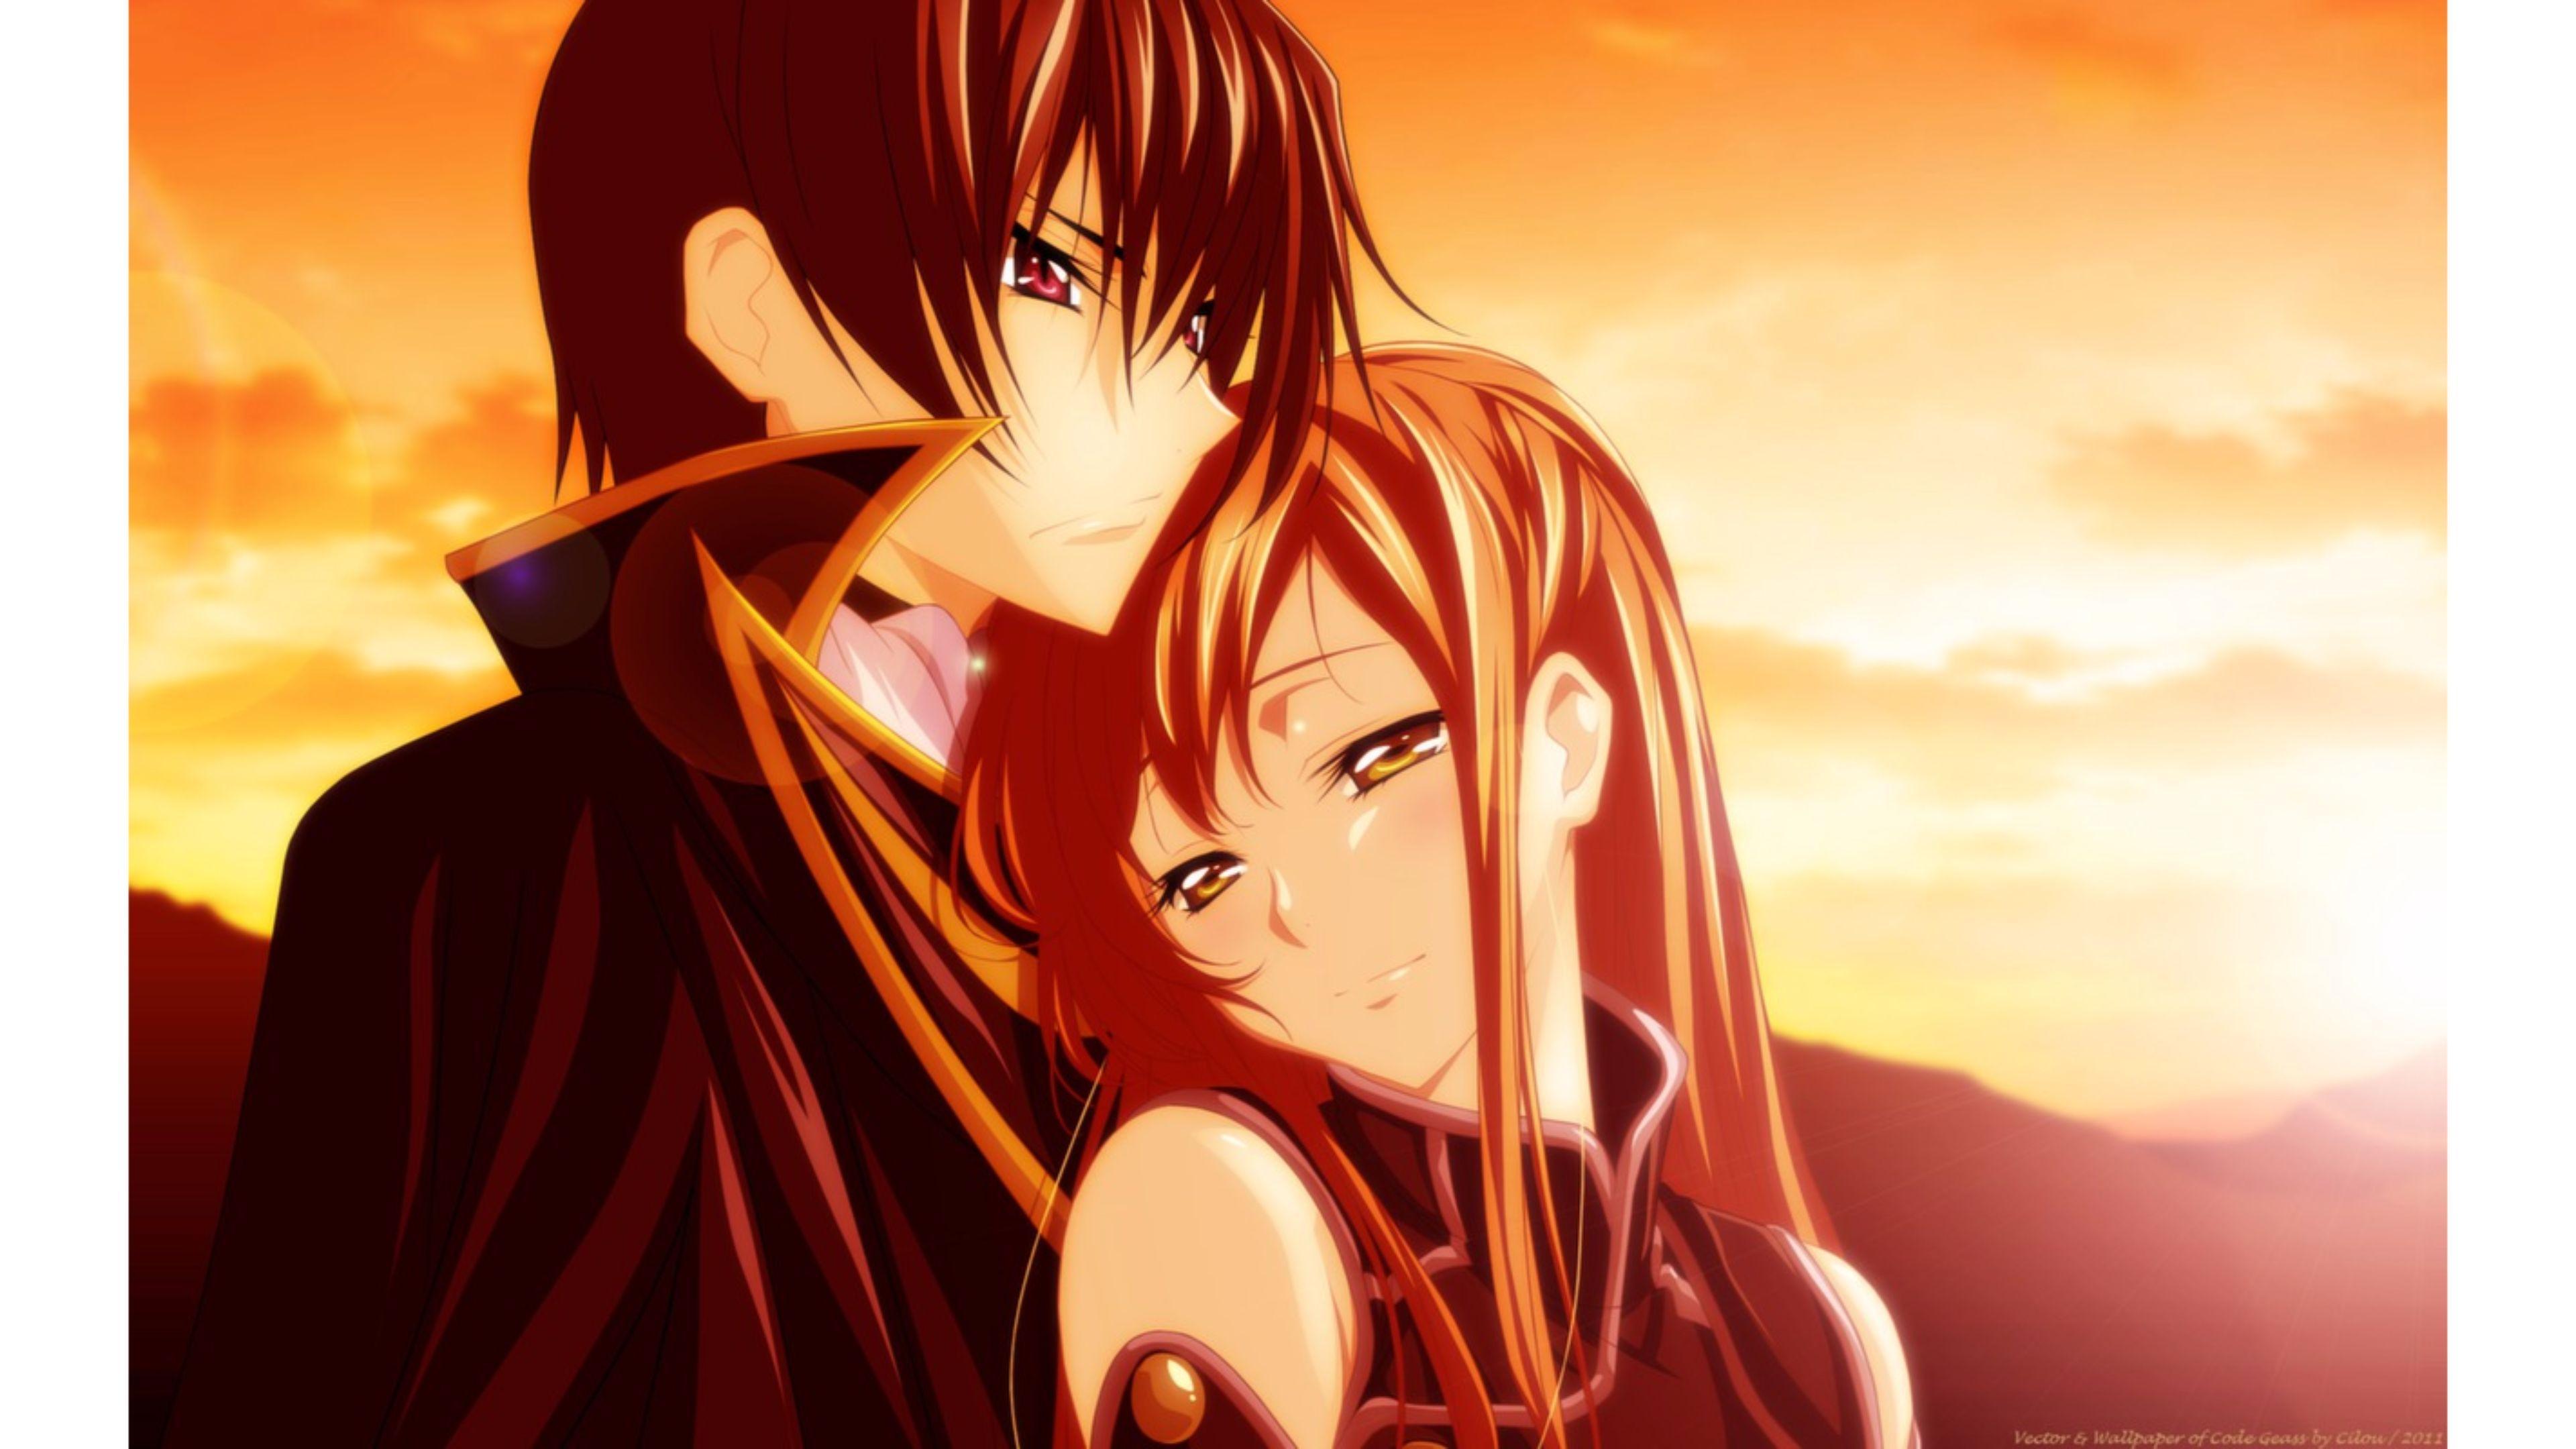 Anime 4k Wallpaper: Top Free Love Anime Backgrounds